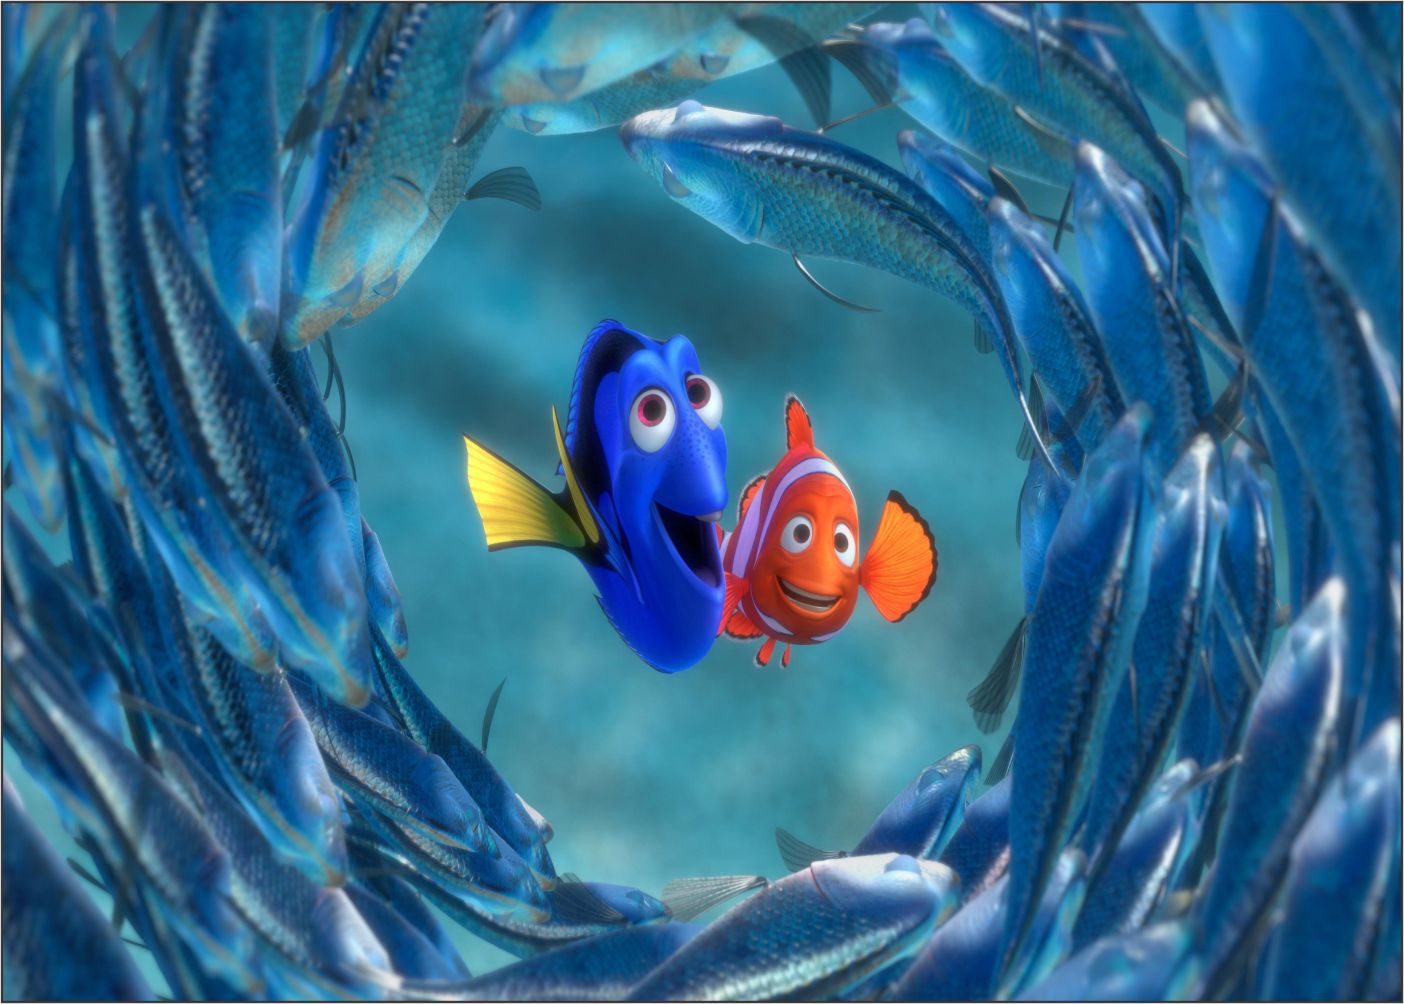 Papel de Parede 3D Nemo 0007 - Adesivos de Parede